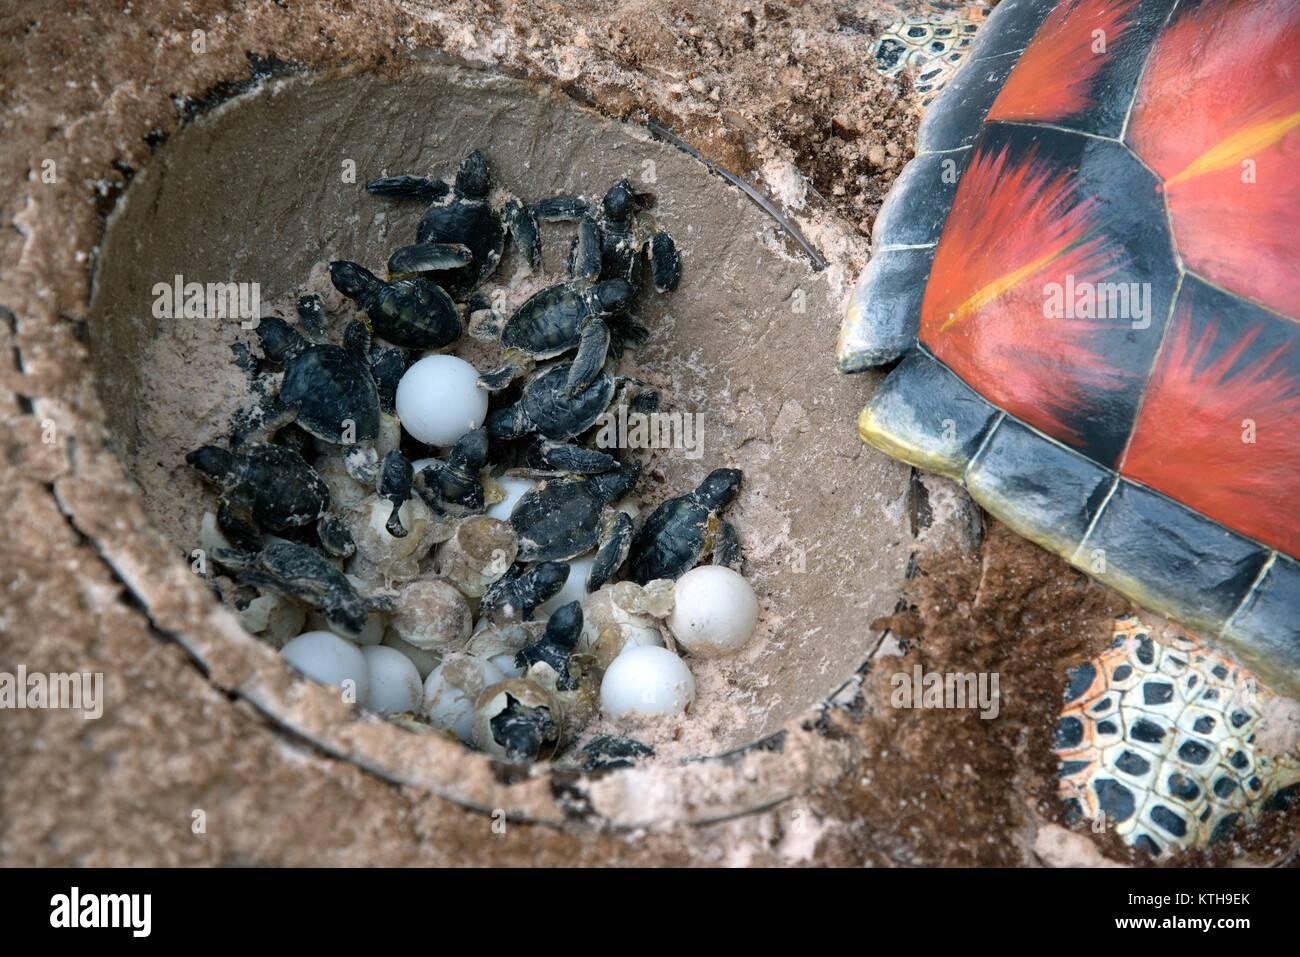 Sea Turtle Nest Hatching Stock Photos & Sea Turtle Nest ... - photo#41